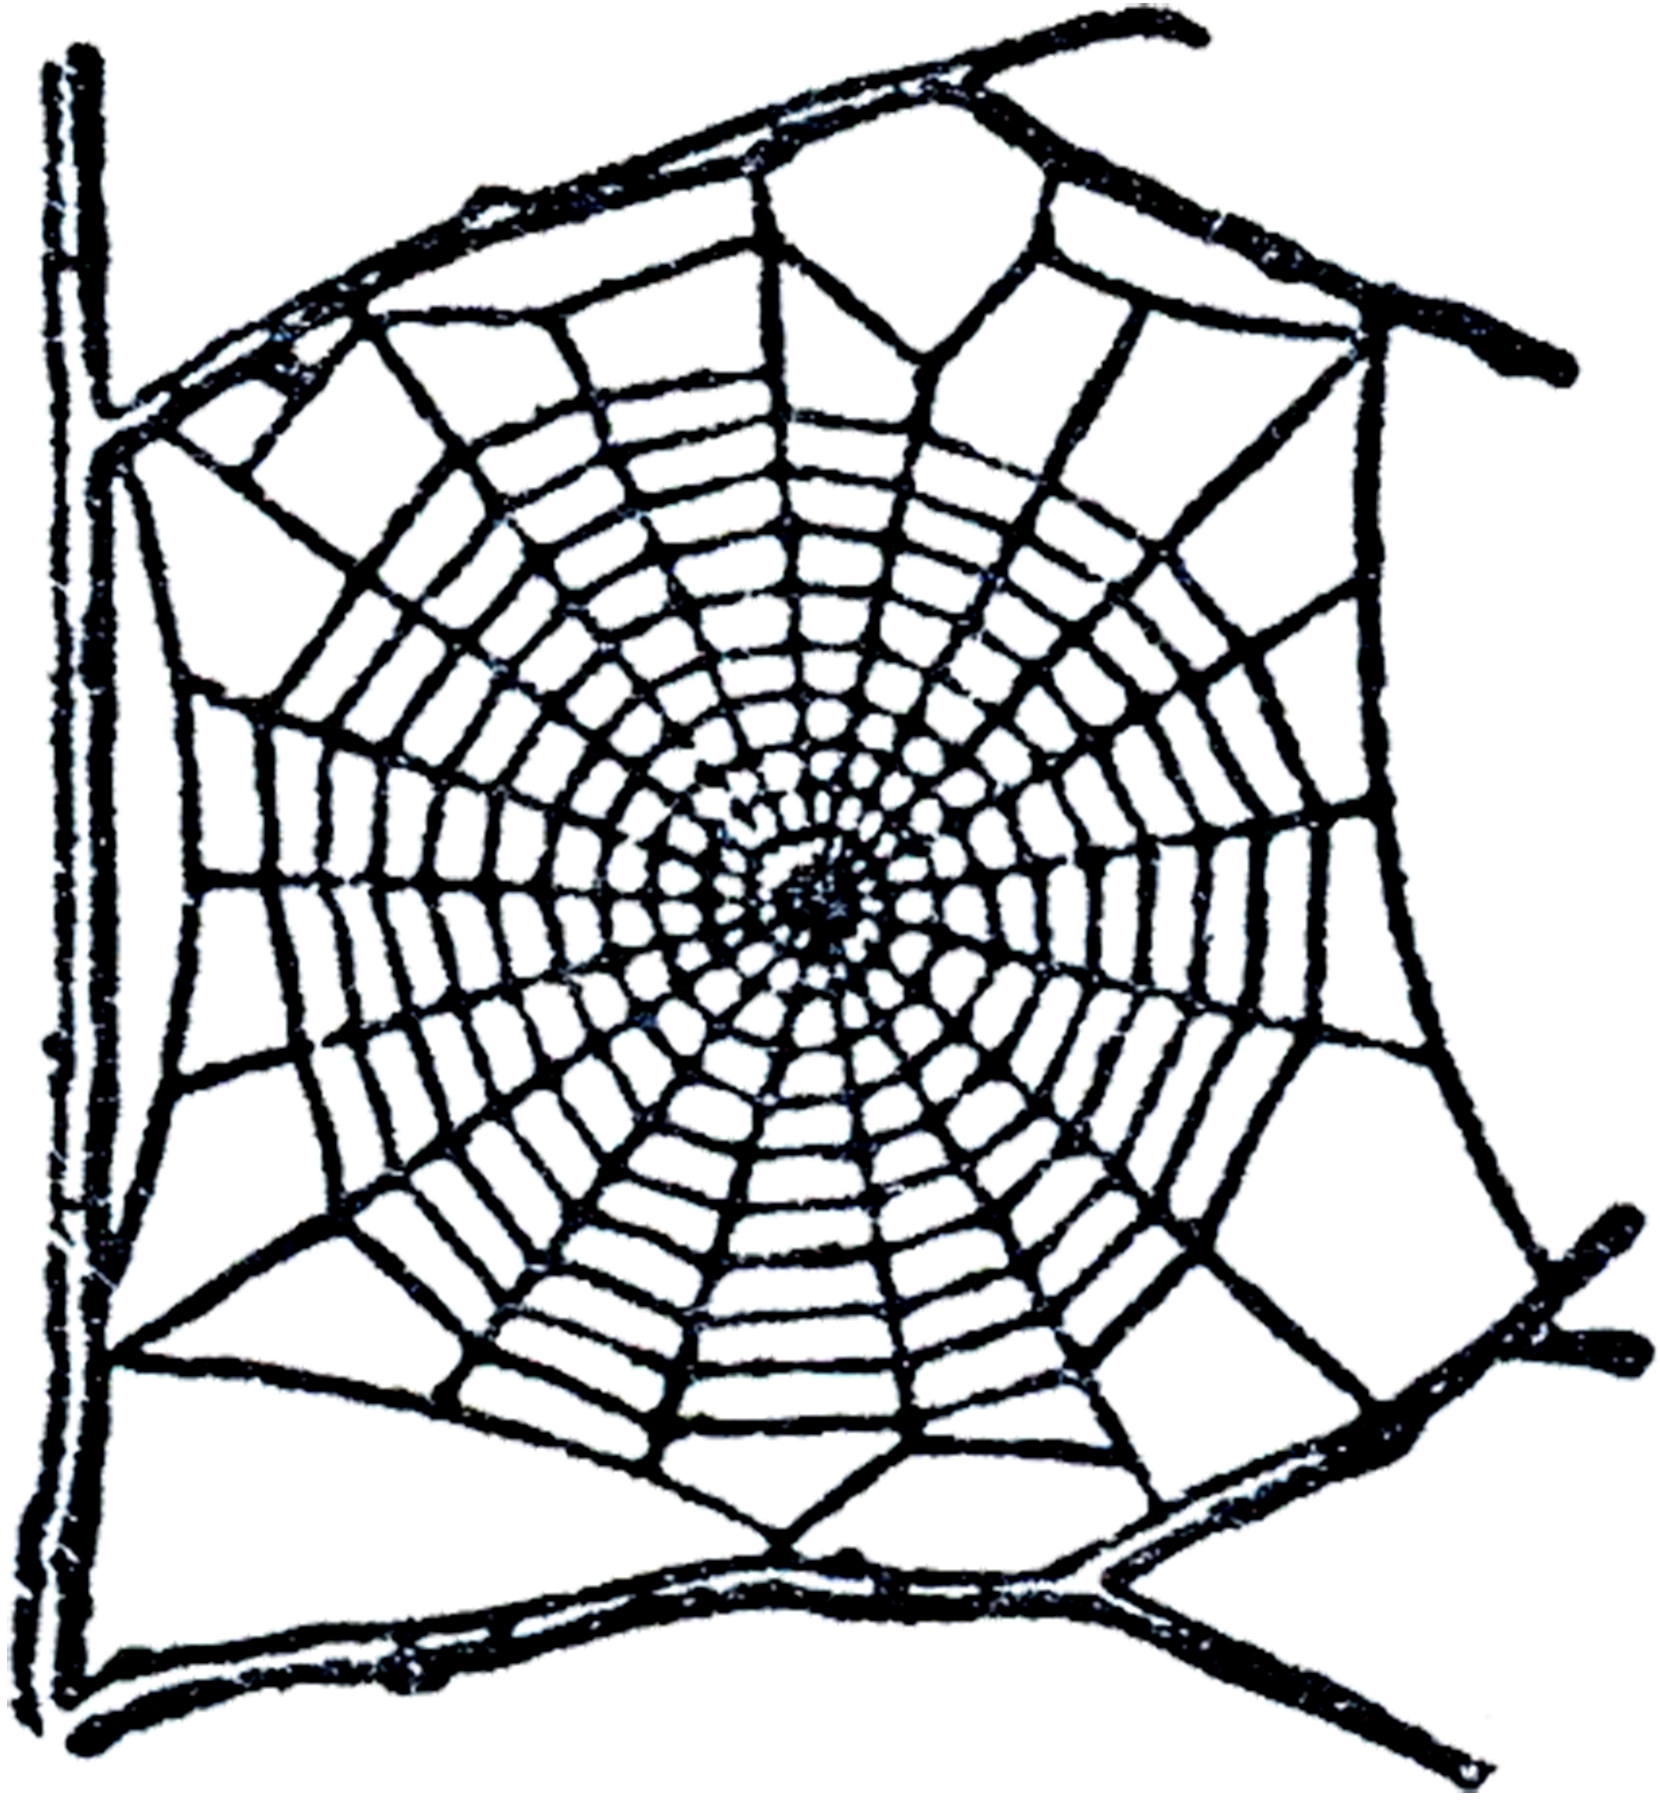 1660x1800 Free Spider Web Clip Art The Graphics Fairy 2